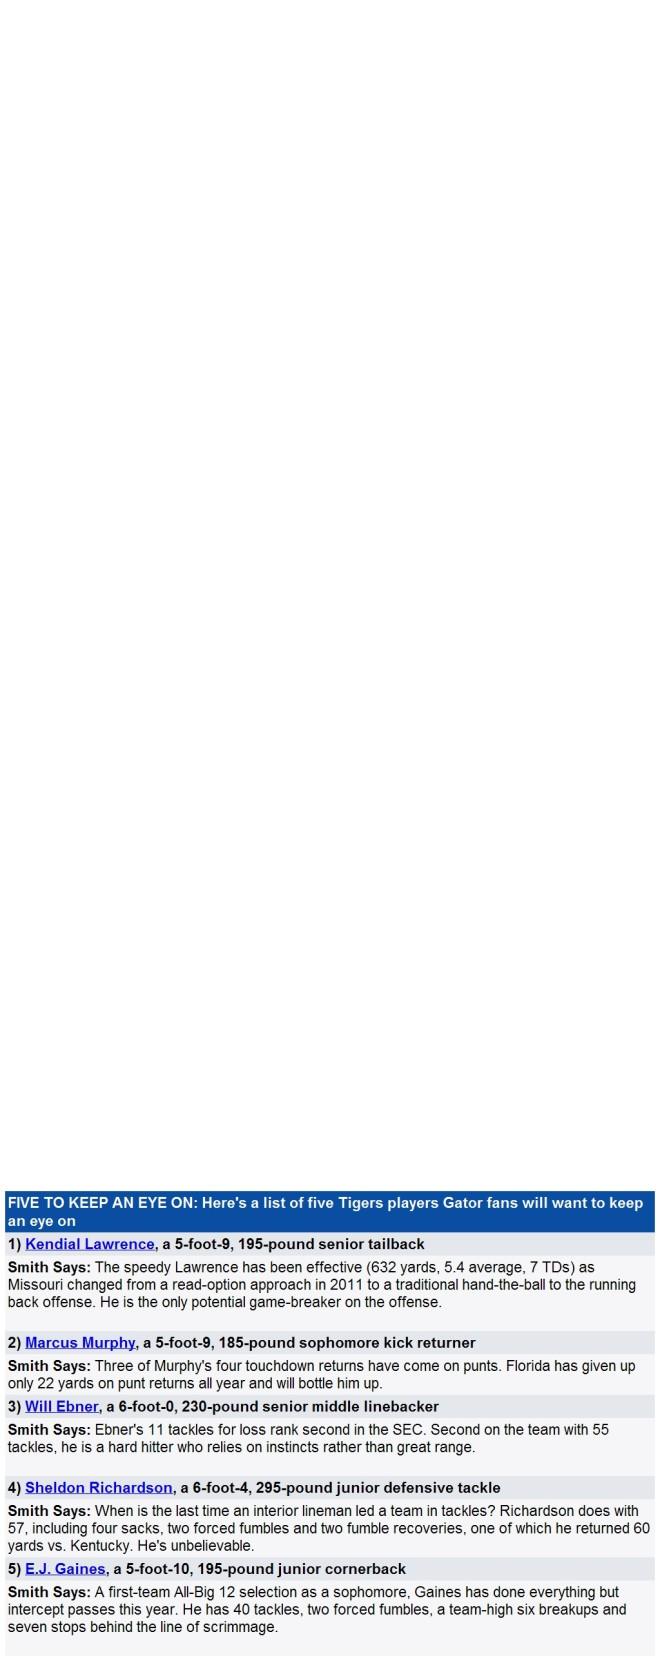 R4fgkkobrilpbkubadrf